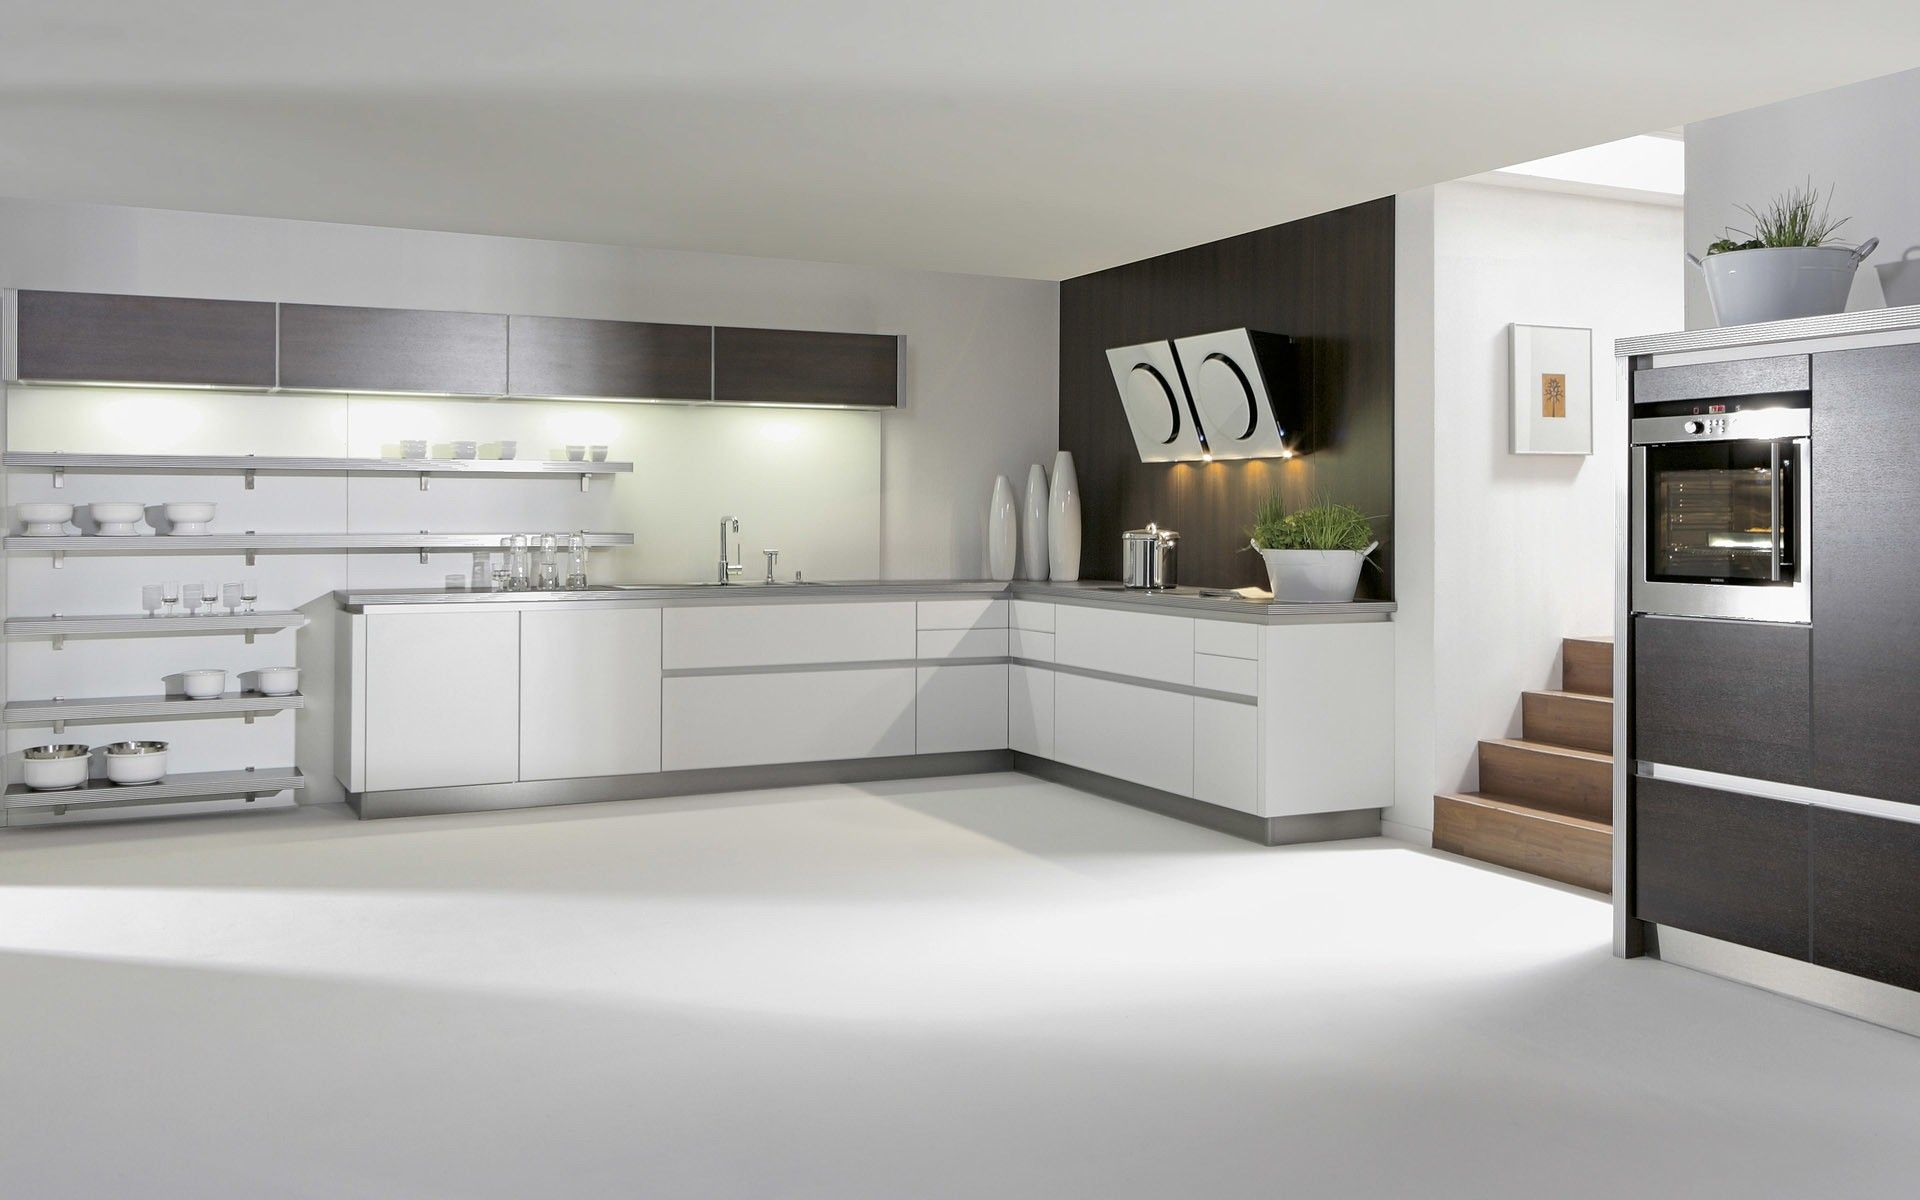 Http Www Nanilumi Com Tag Simple Middle Class Kitchen Design 20 White Kitchen Interior White Kitchen Interior Design Modern Kitchen Cabinet Design